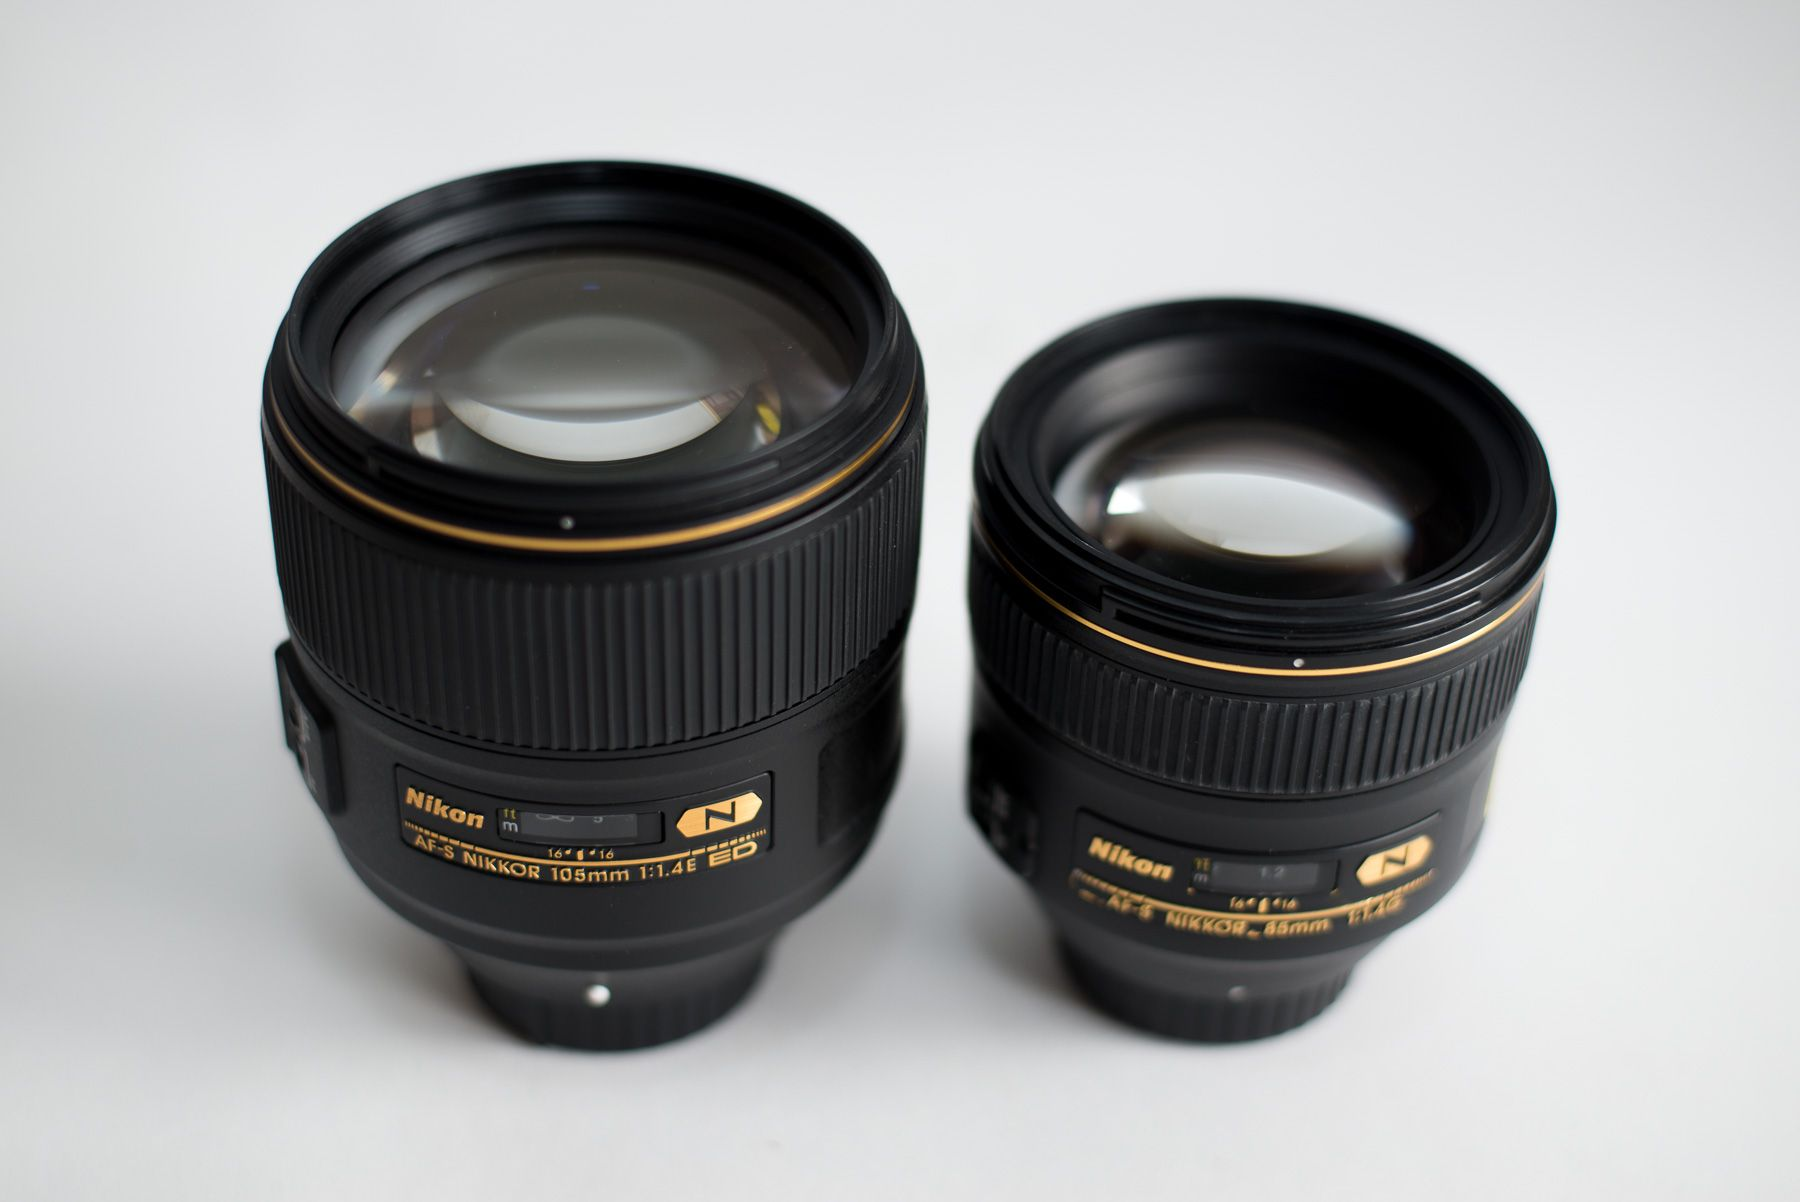 Nikon Af S Nikkor 105mm F 1 4e Ed Review And Comparison With The Nikkor 85mm F 1 4g Lens Nikon Rumors Nikon Camera Nikon Lens